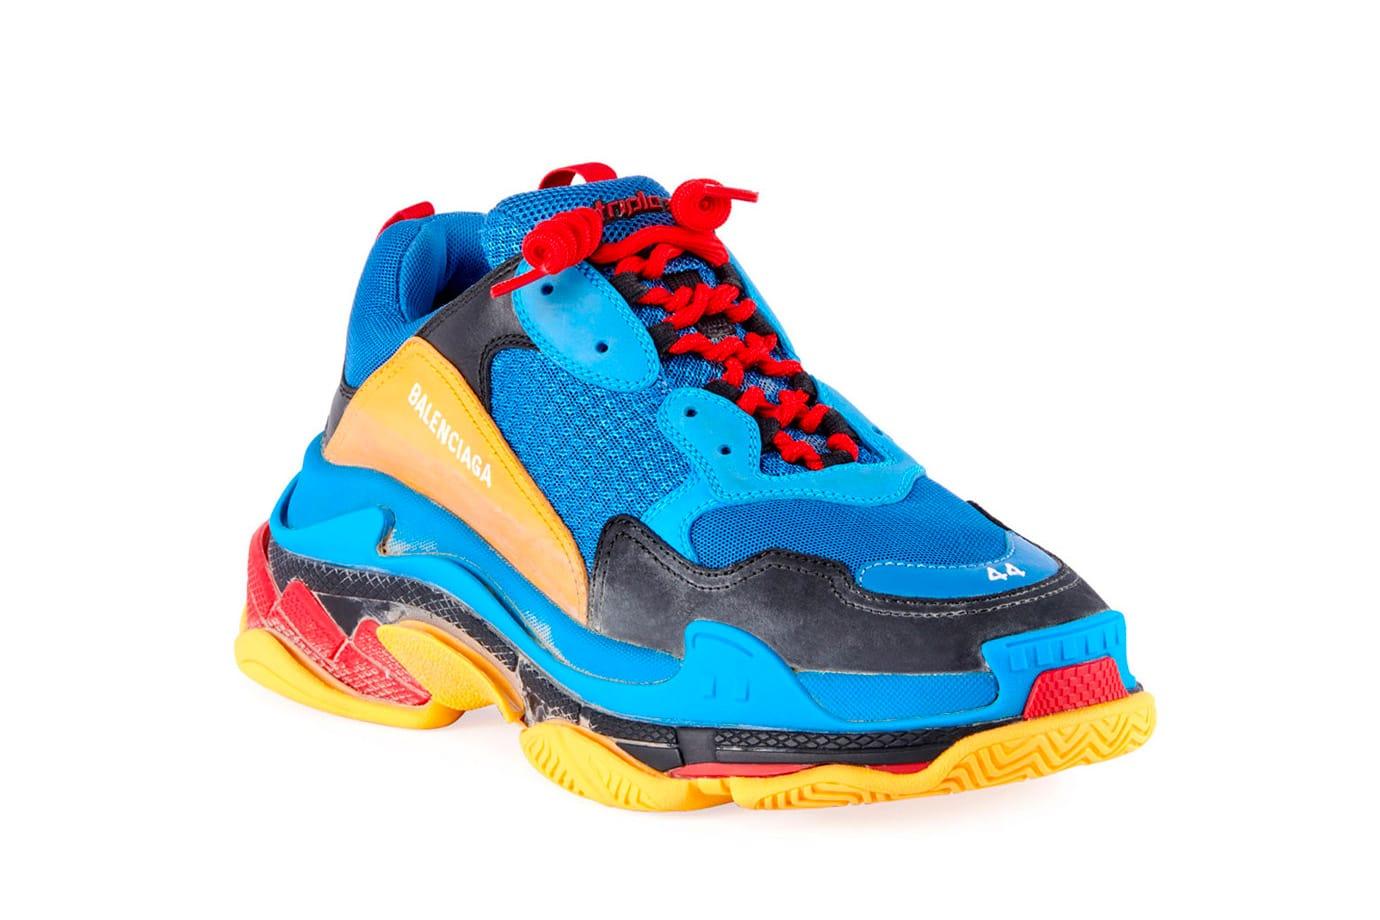 colorful balenciaga shoes